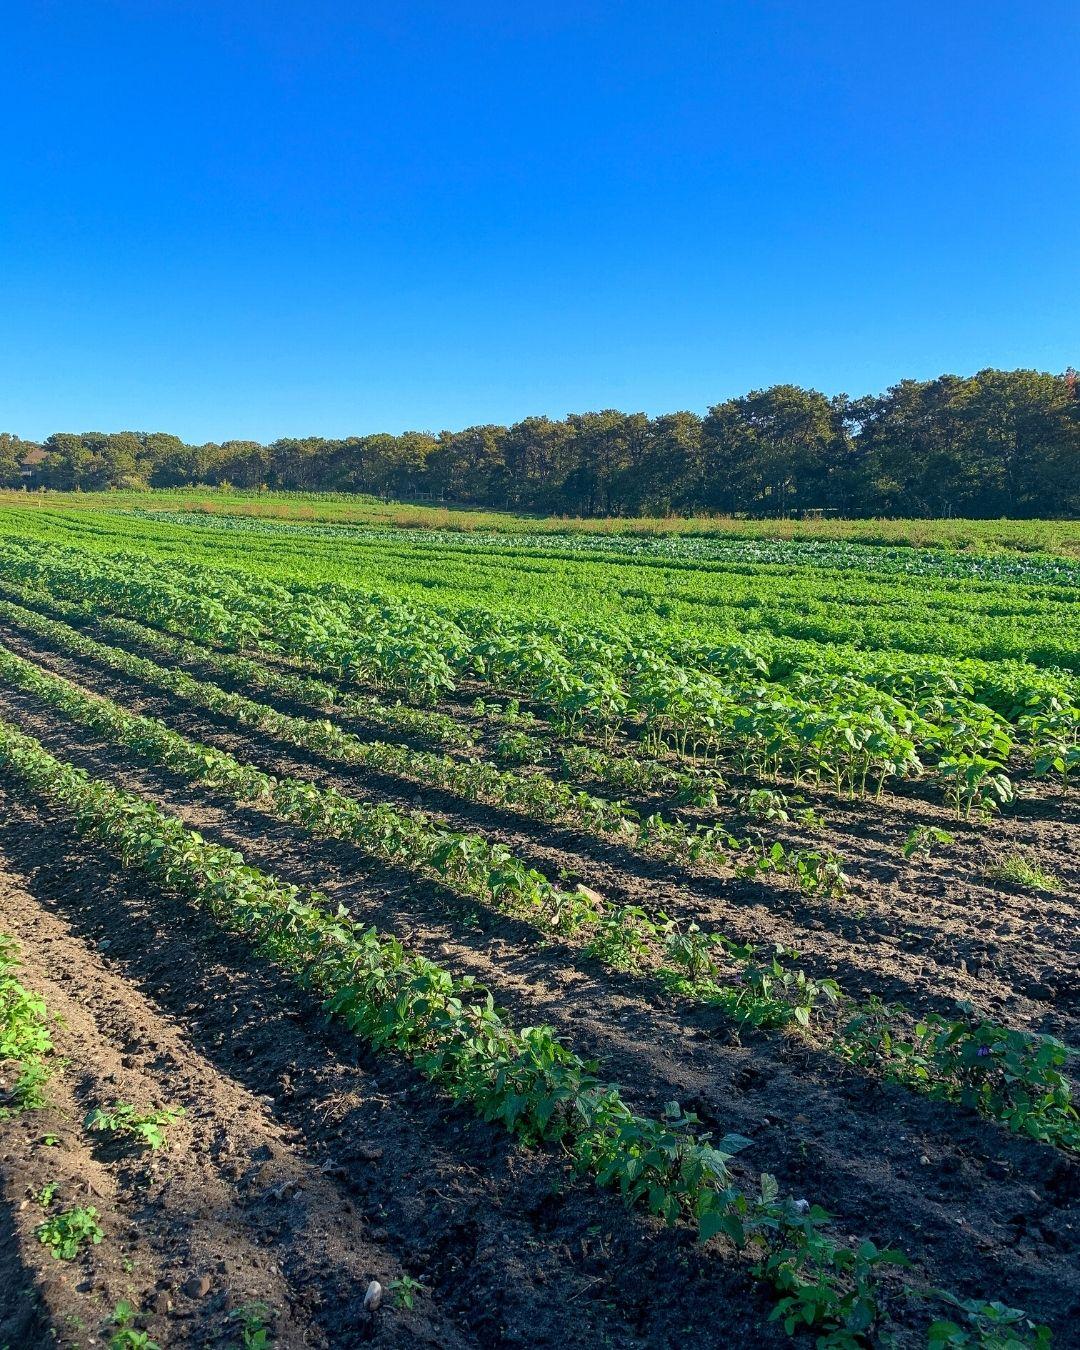 Morning Glory Farm Marthas Vineyard-2